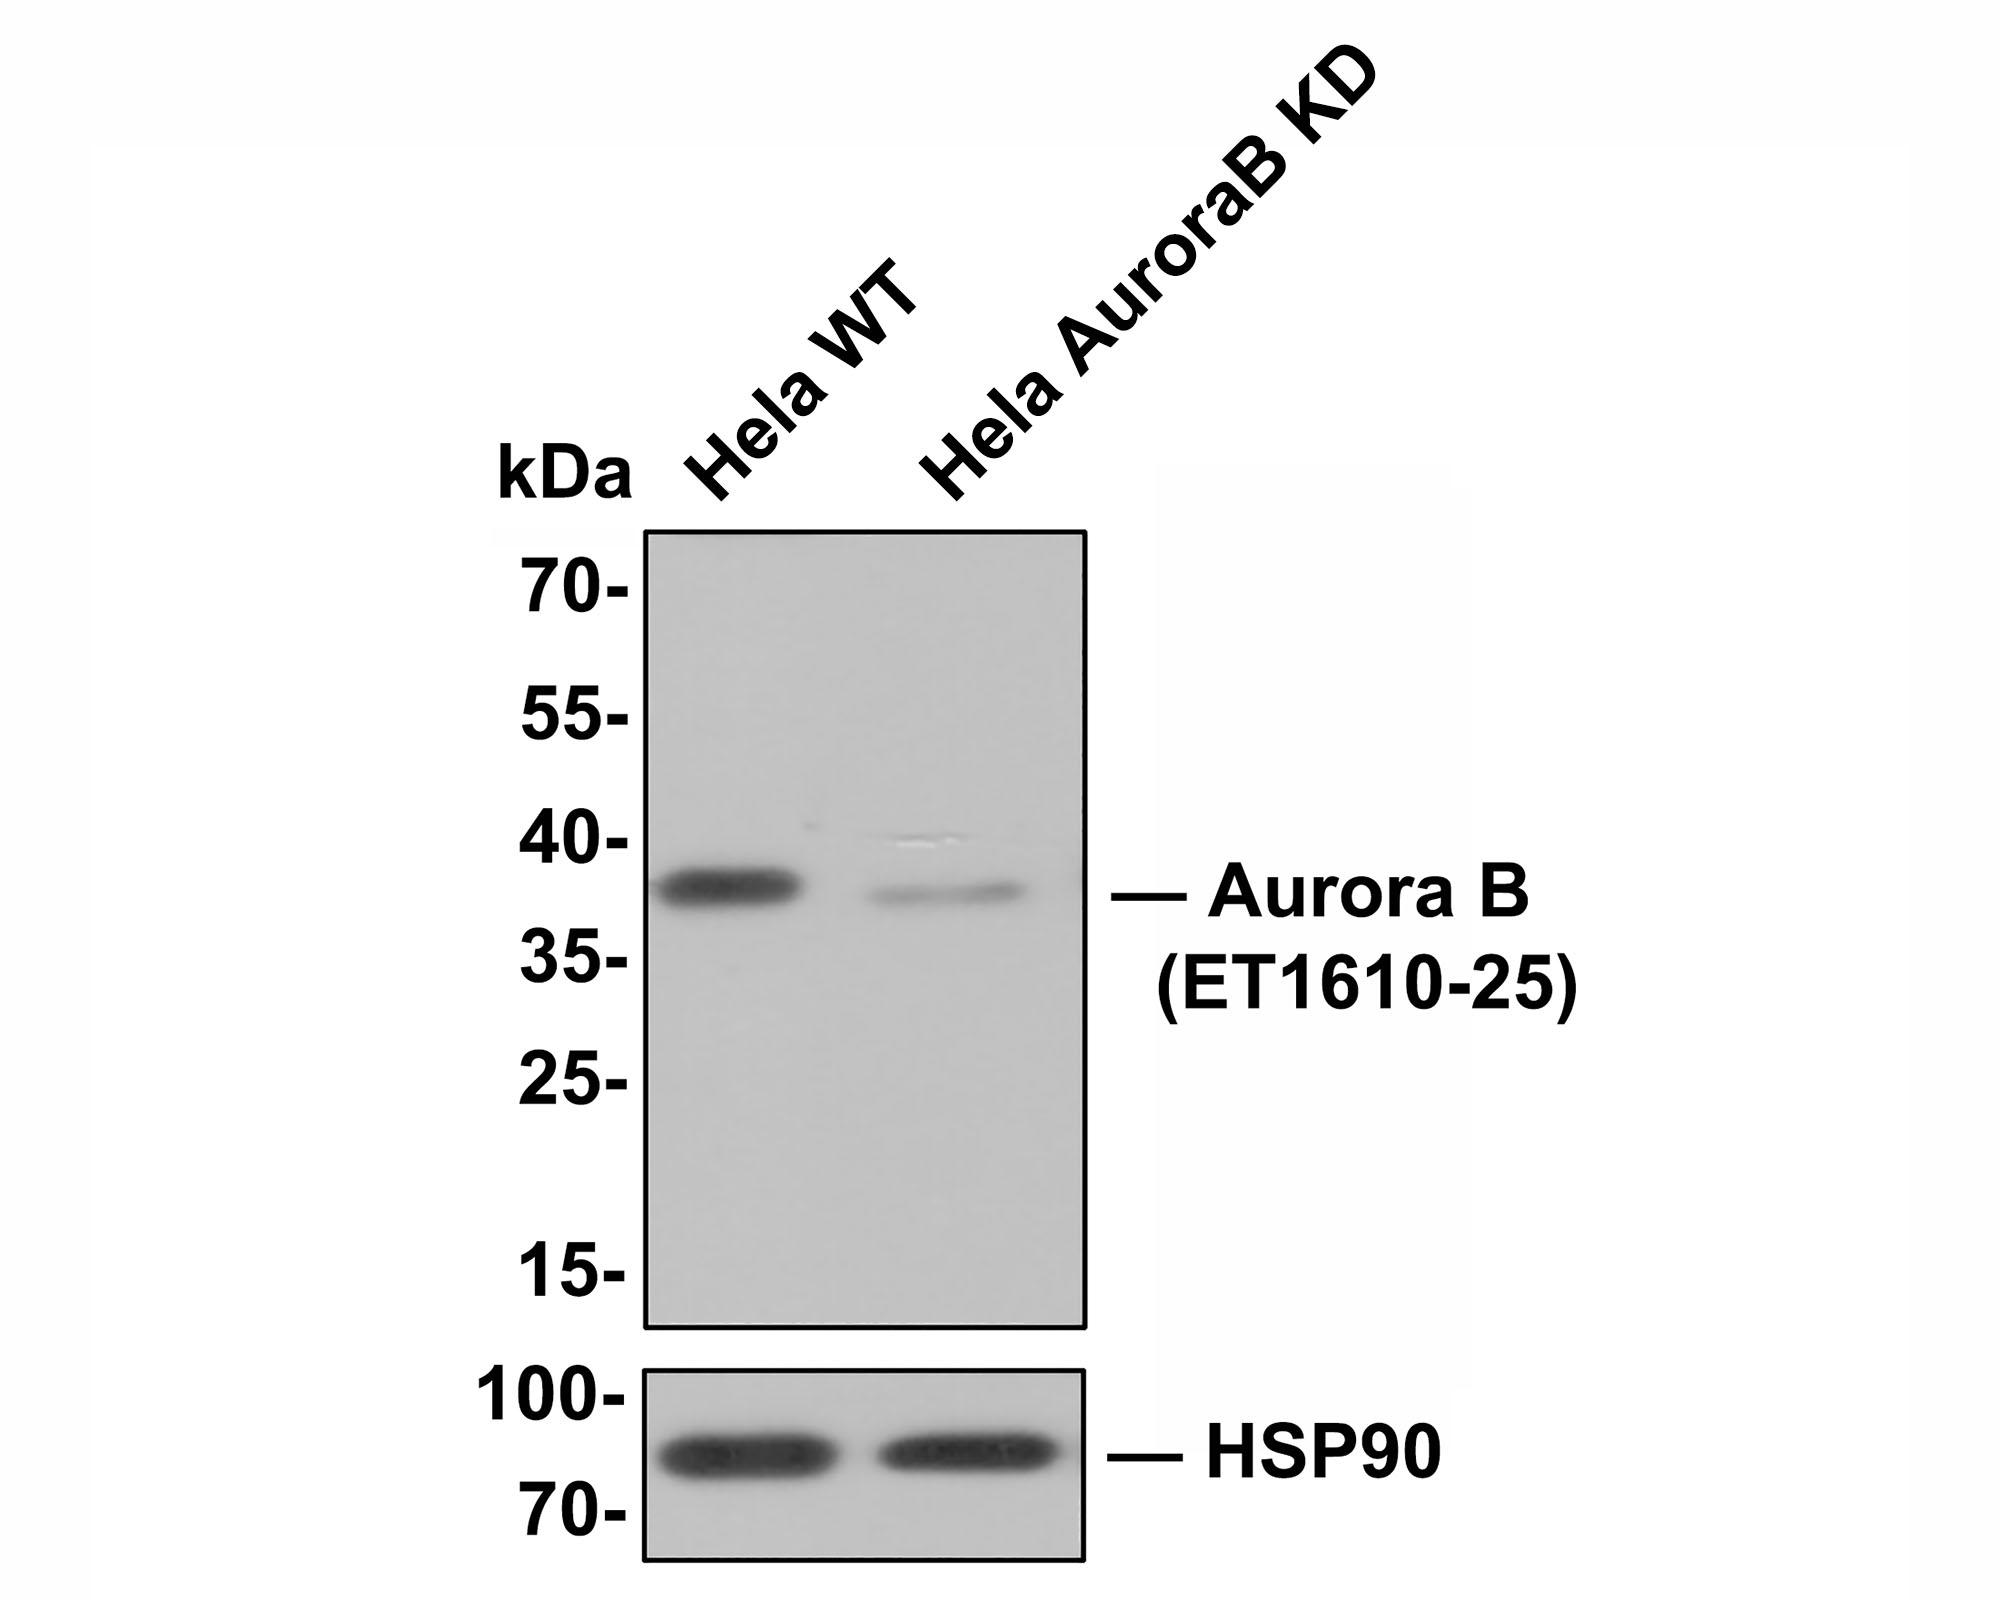 Immunohistochemical analysis of paraffin-embedded human tonsil tissue using anti-Aurora B antibody. Counter stained with hematoxylin.